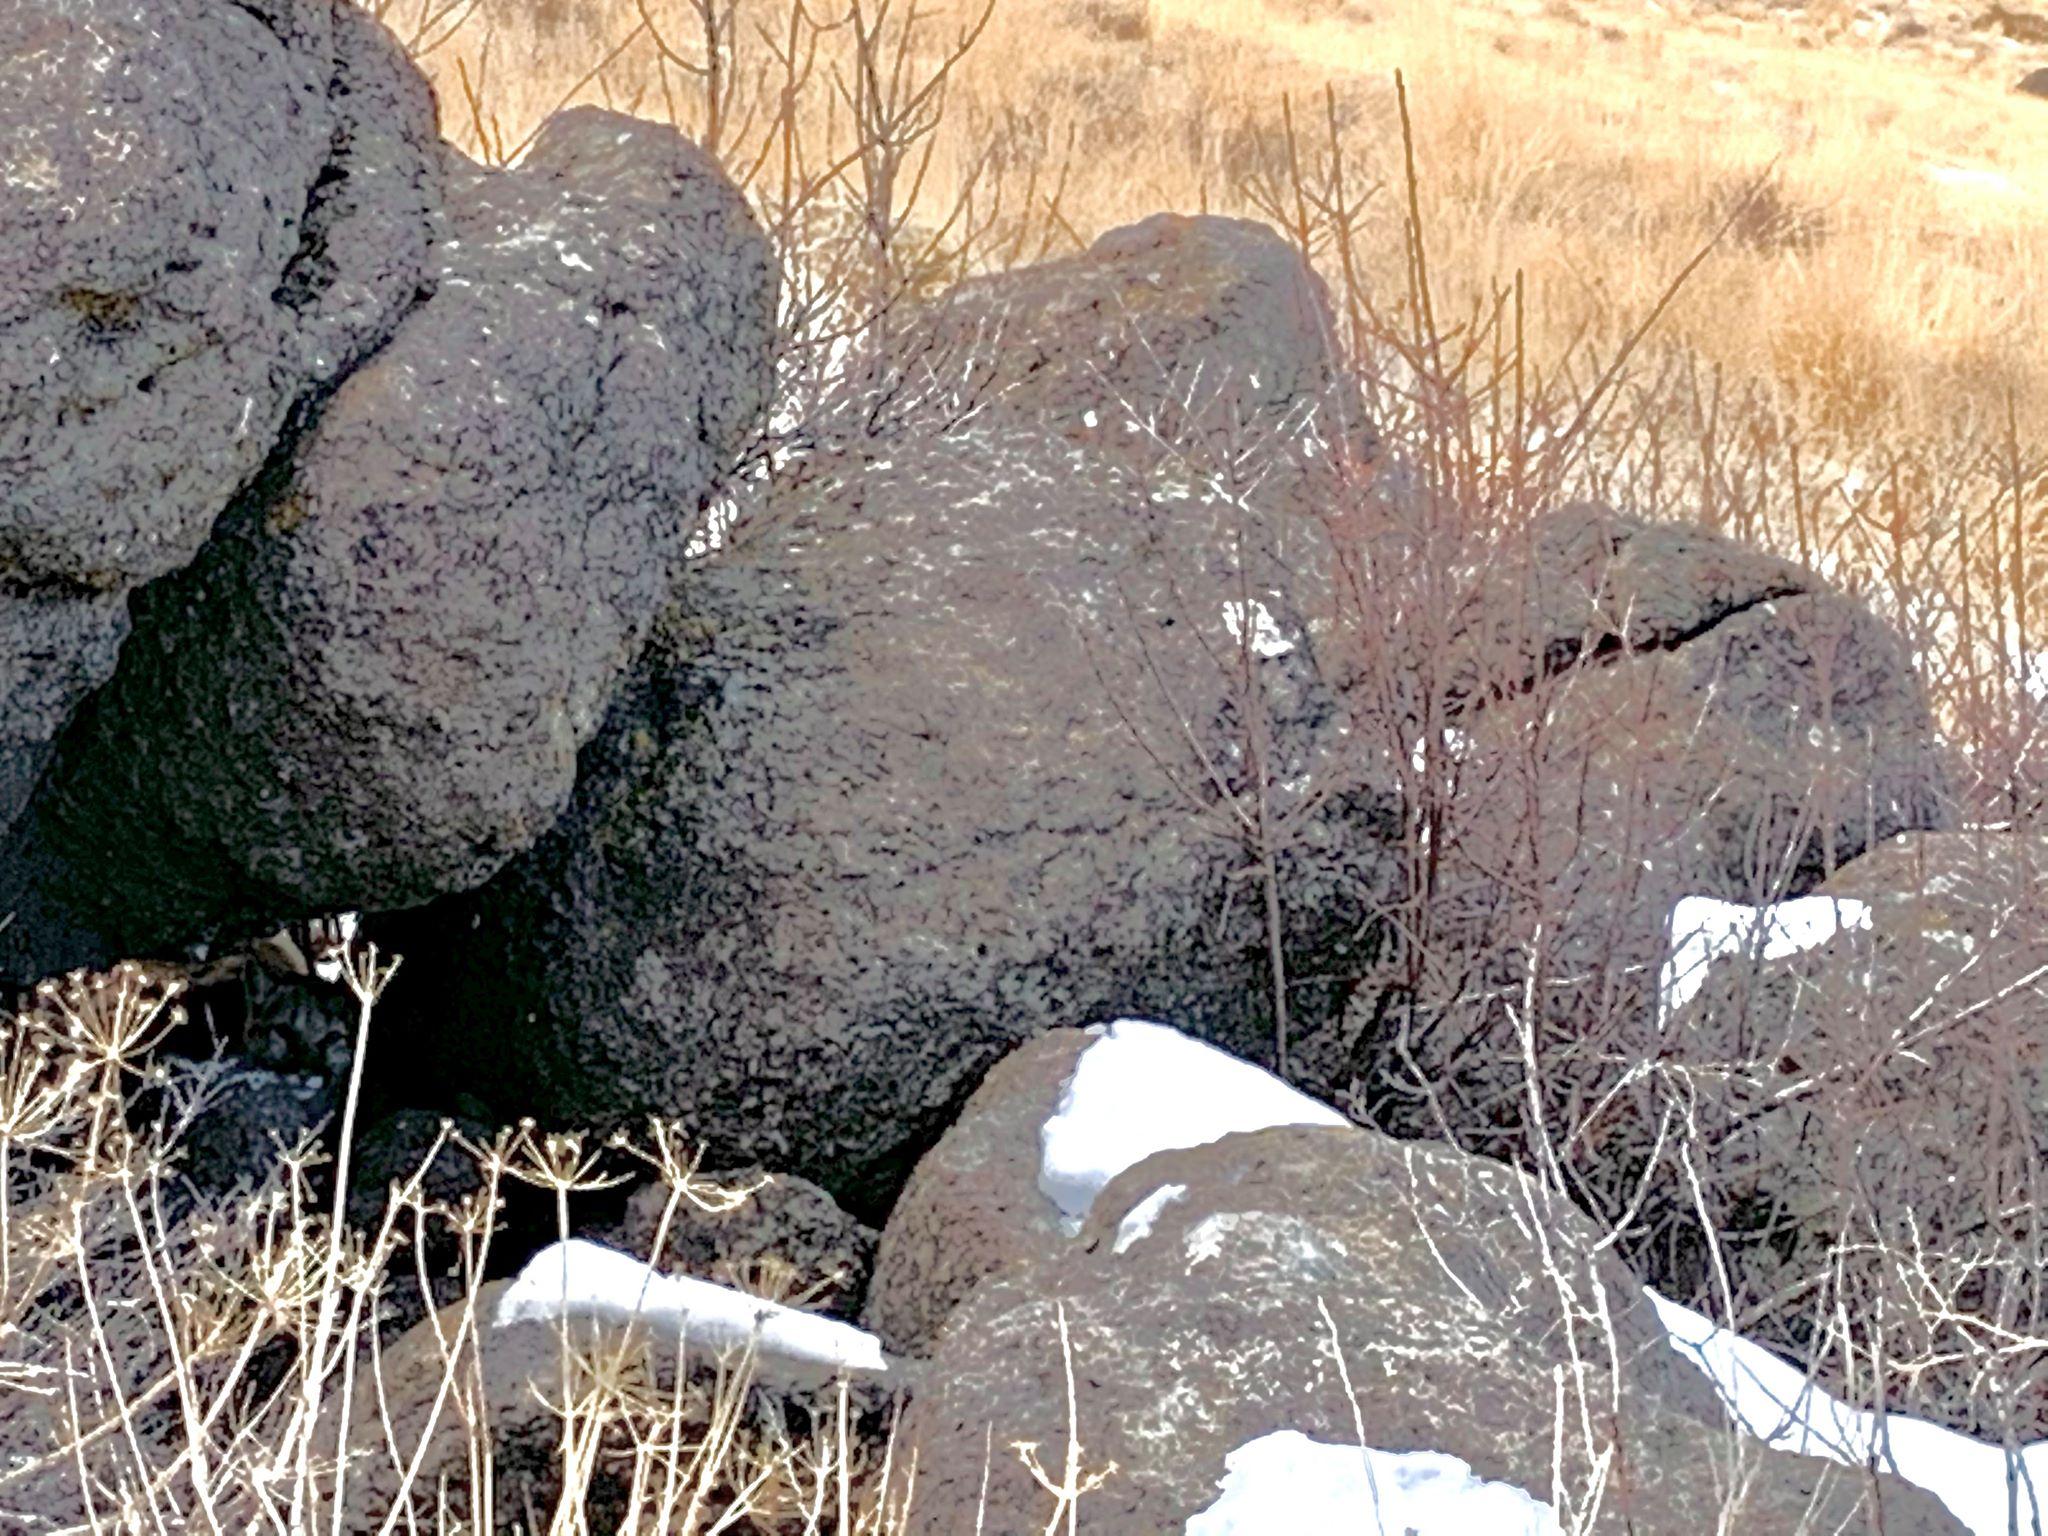 Hidden mountain lion in Nevada